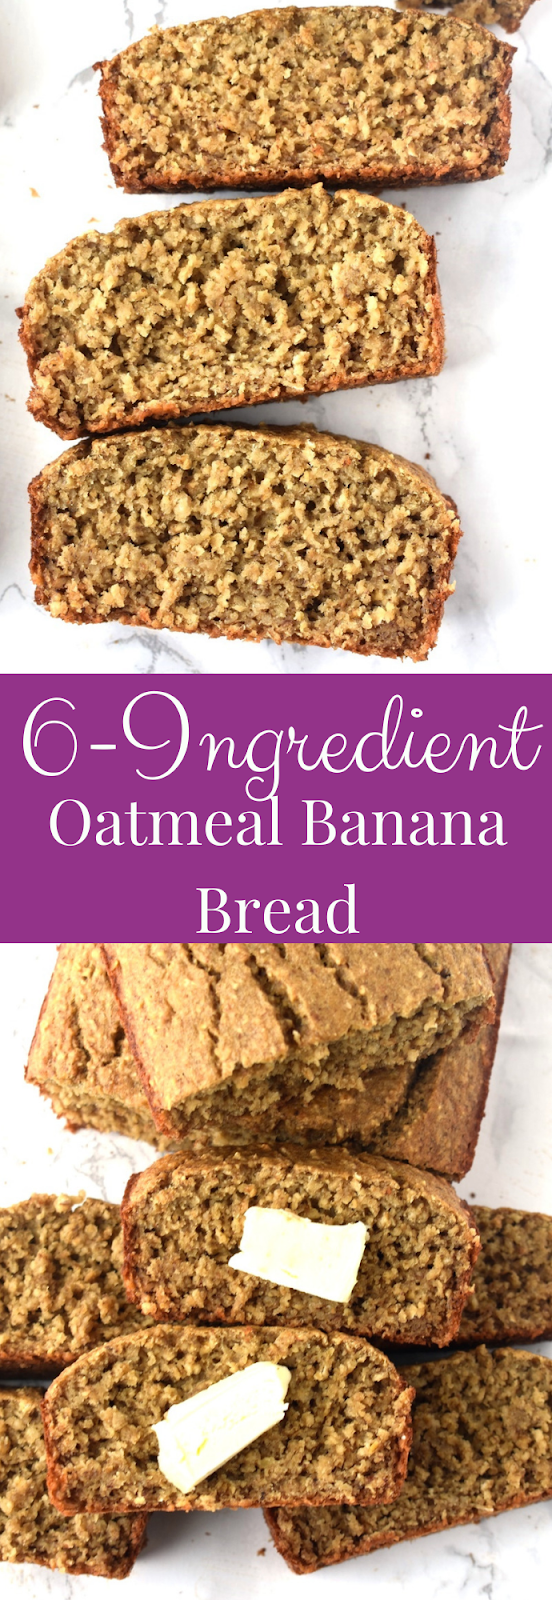 6-Ingredient Oatmeal Banana Bread recipe